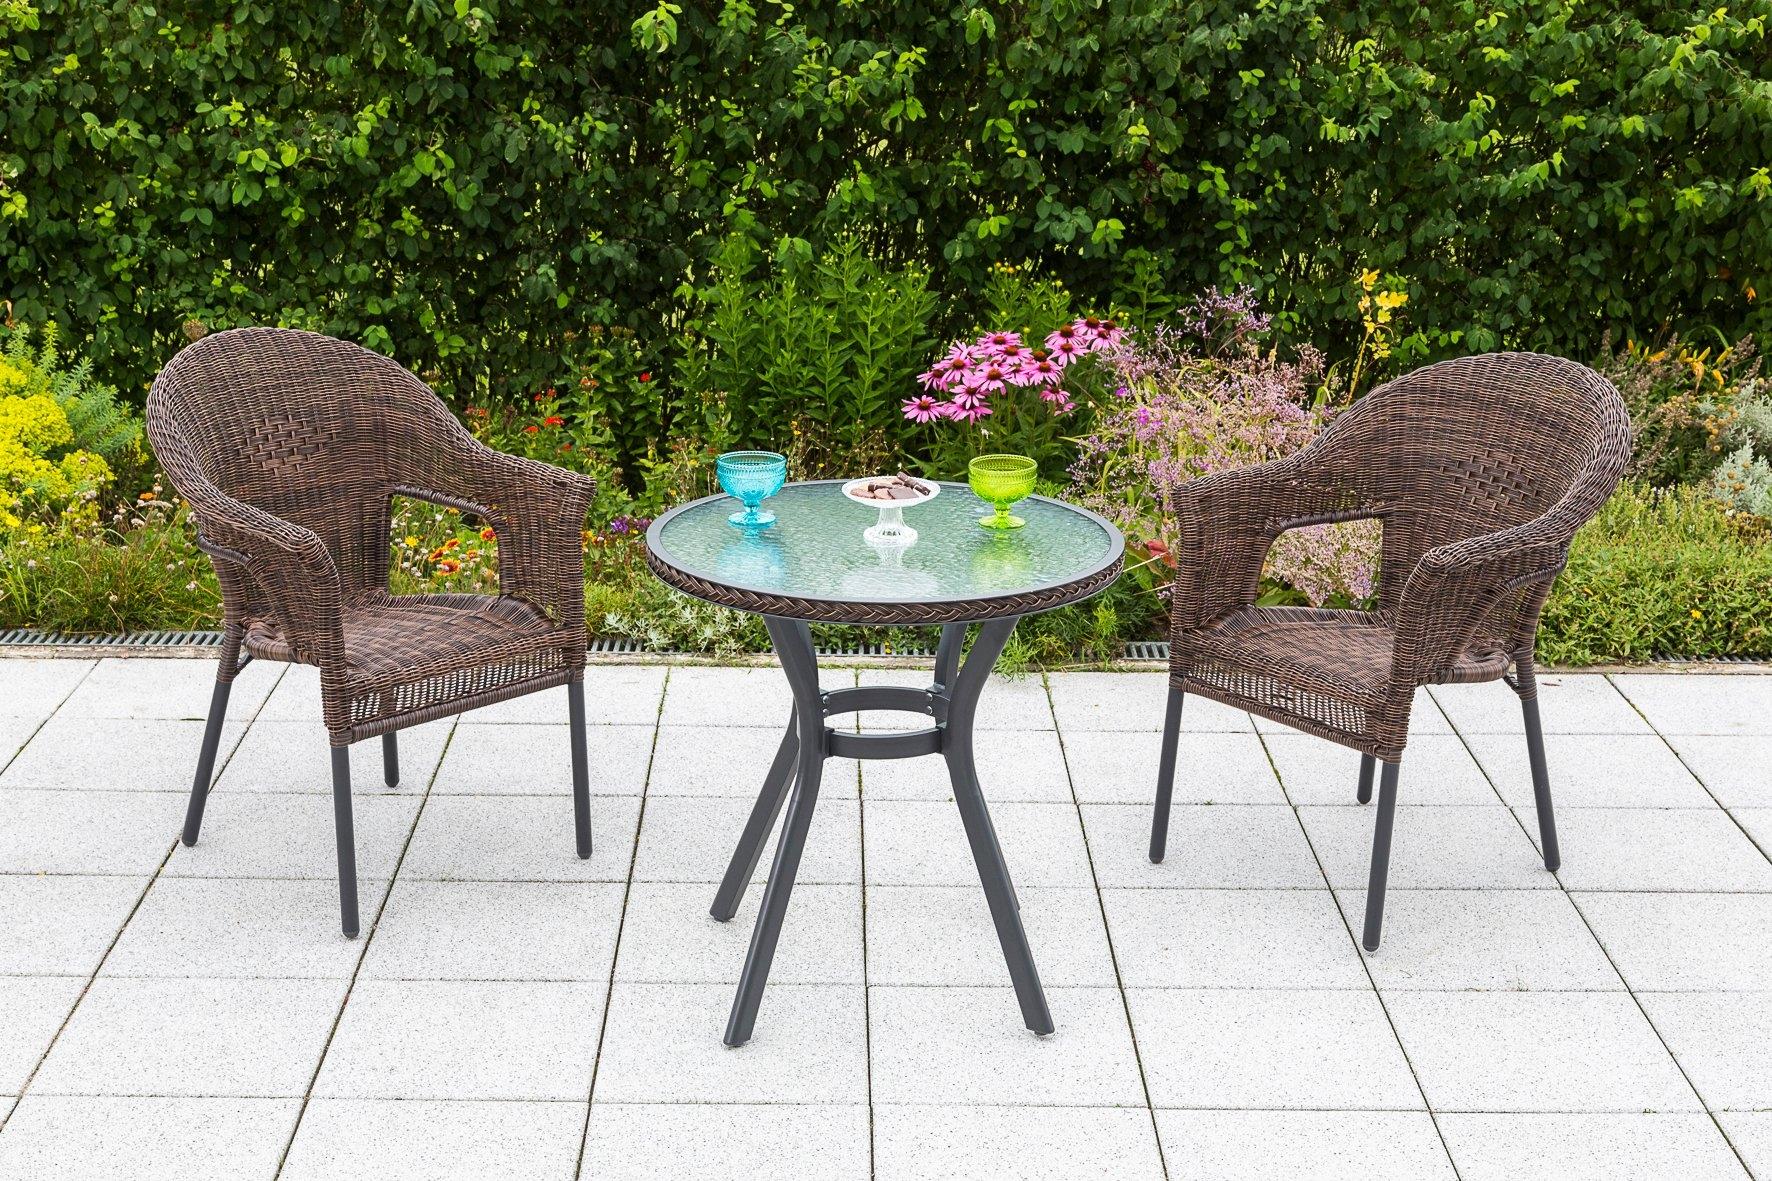 Rotan Stoel Goedkoop : Merxx tuinmeubelset »ravenna« 3 dlg. 2 stoelen en 1 tafel